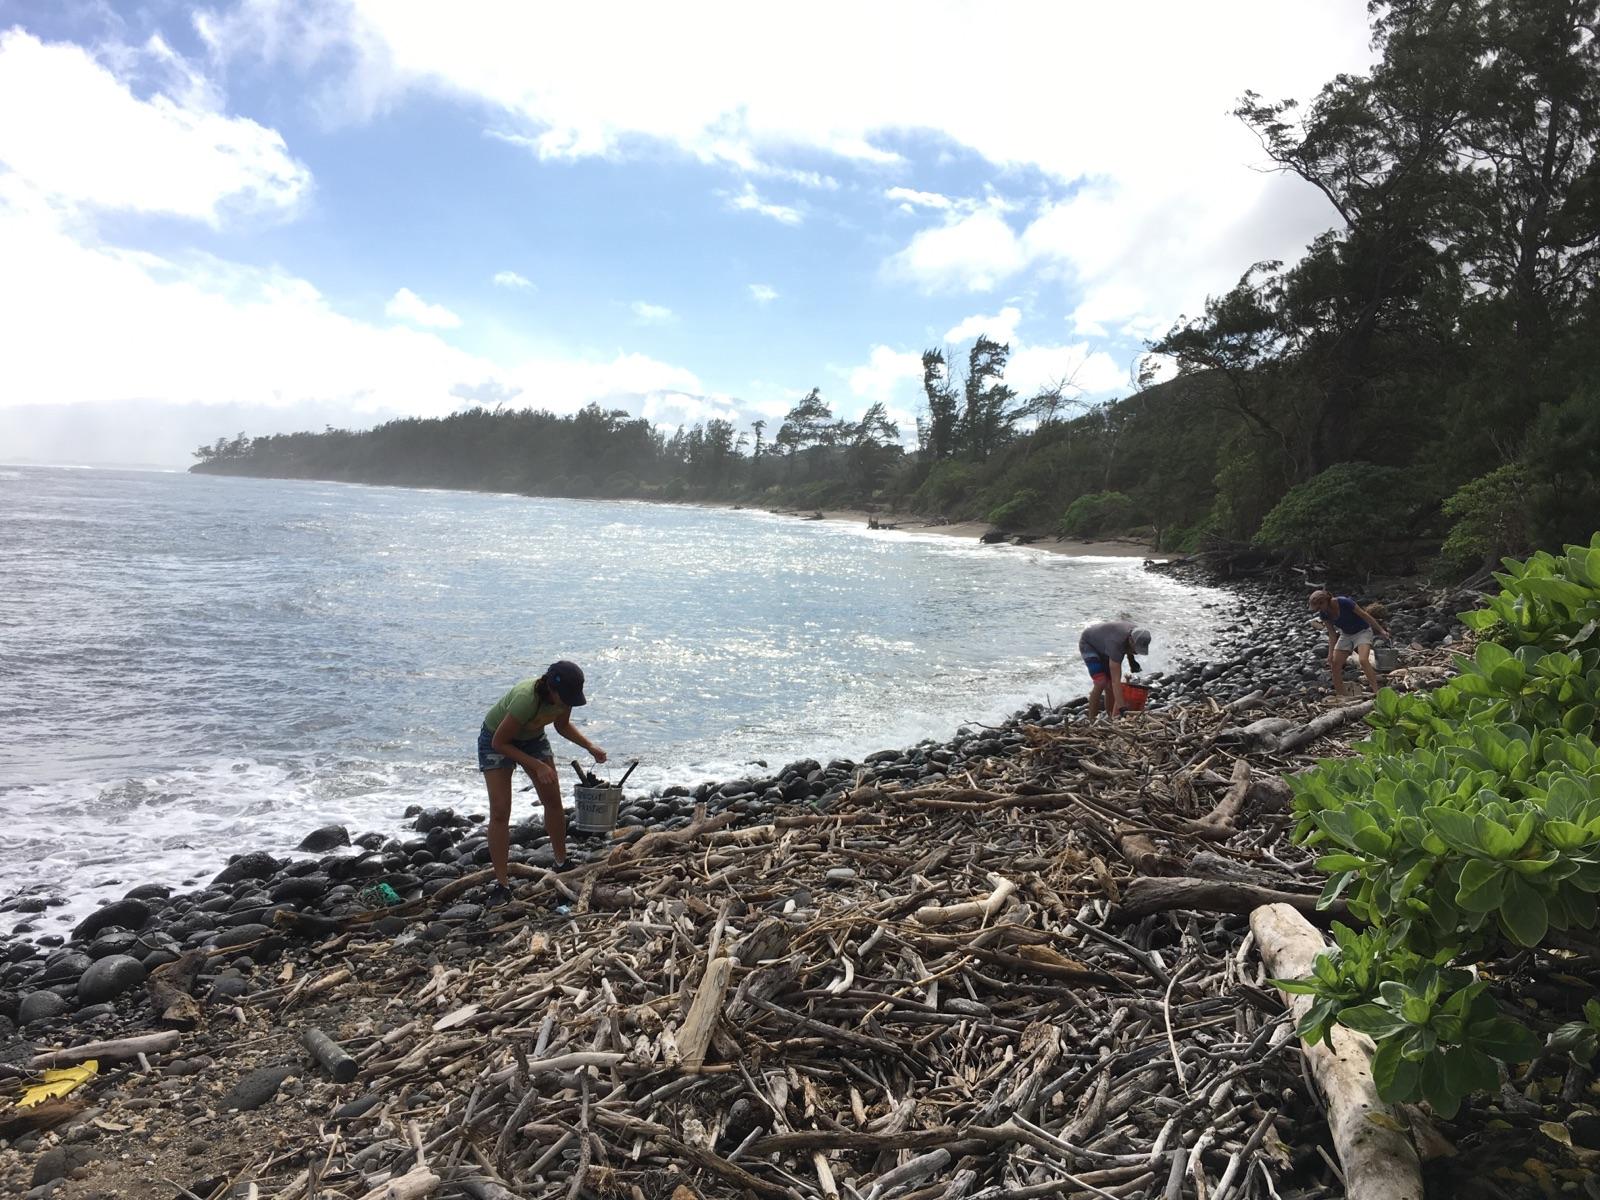 Skyline Eco-Adventures Beach Clean Up at Waihee